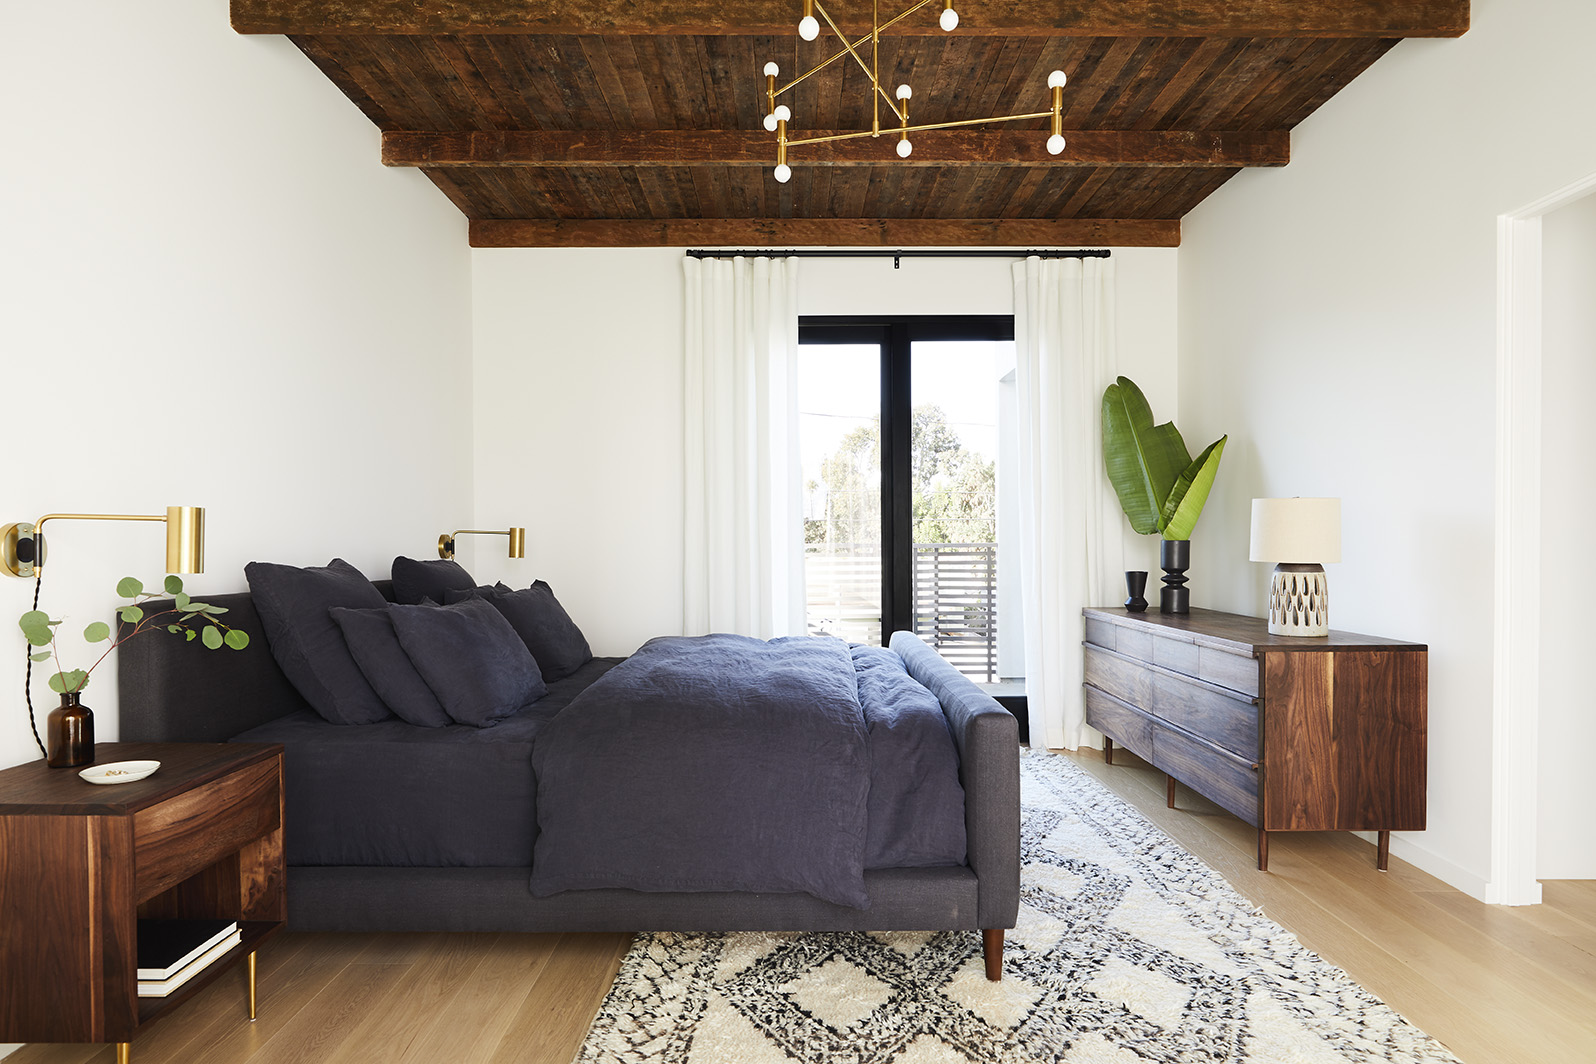 Jette_Rialto_Bedroom_Master_013.jpg